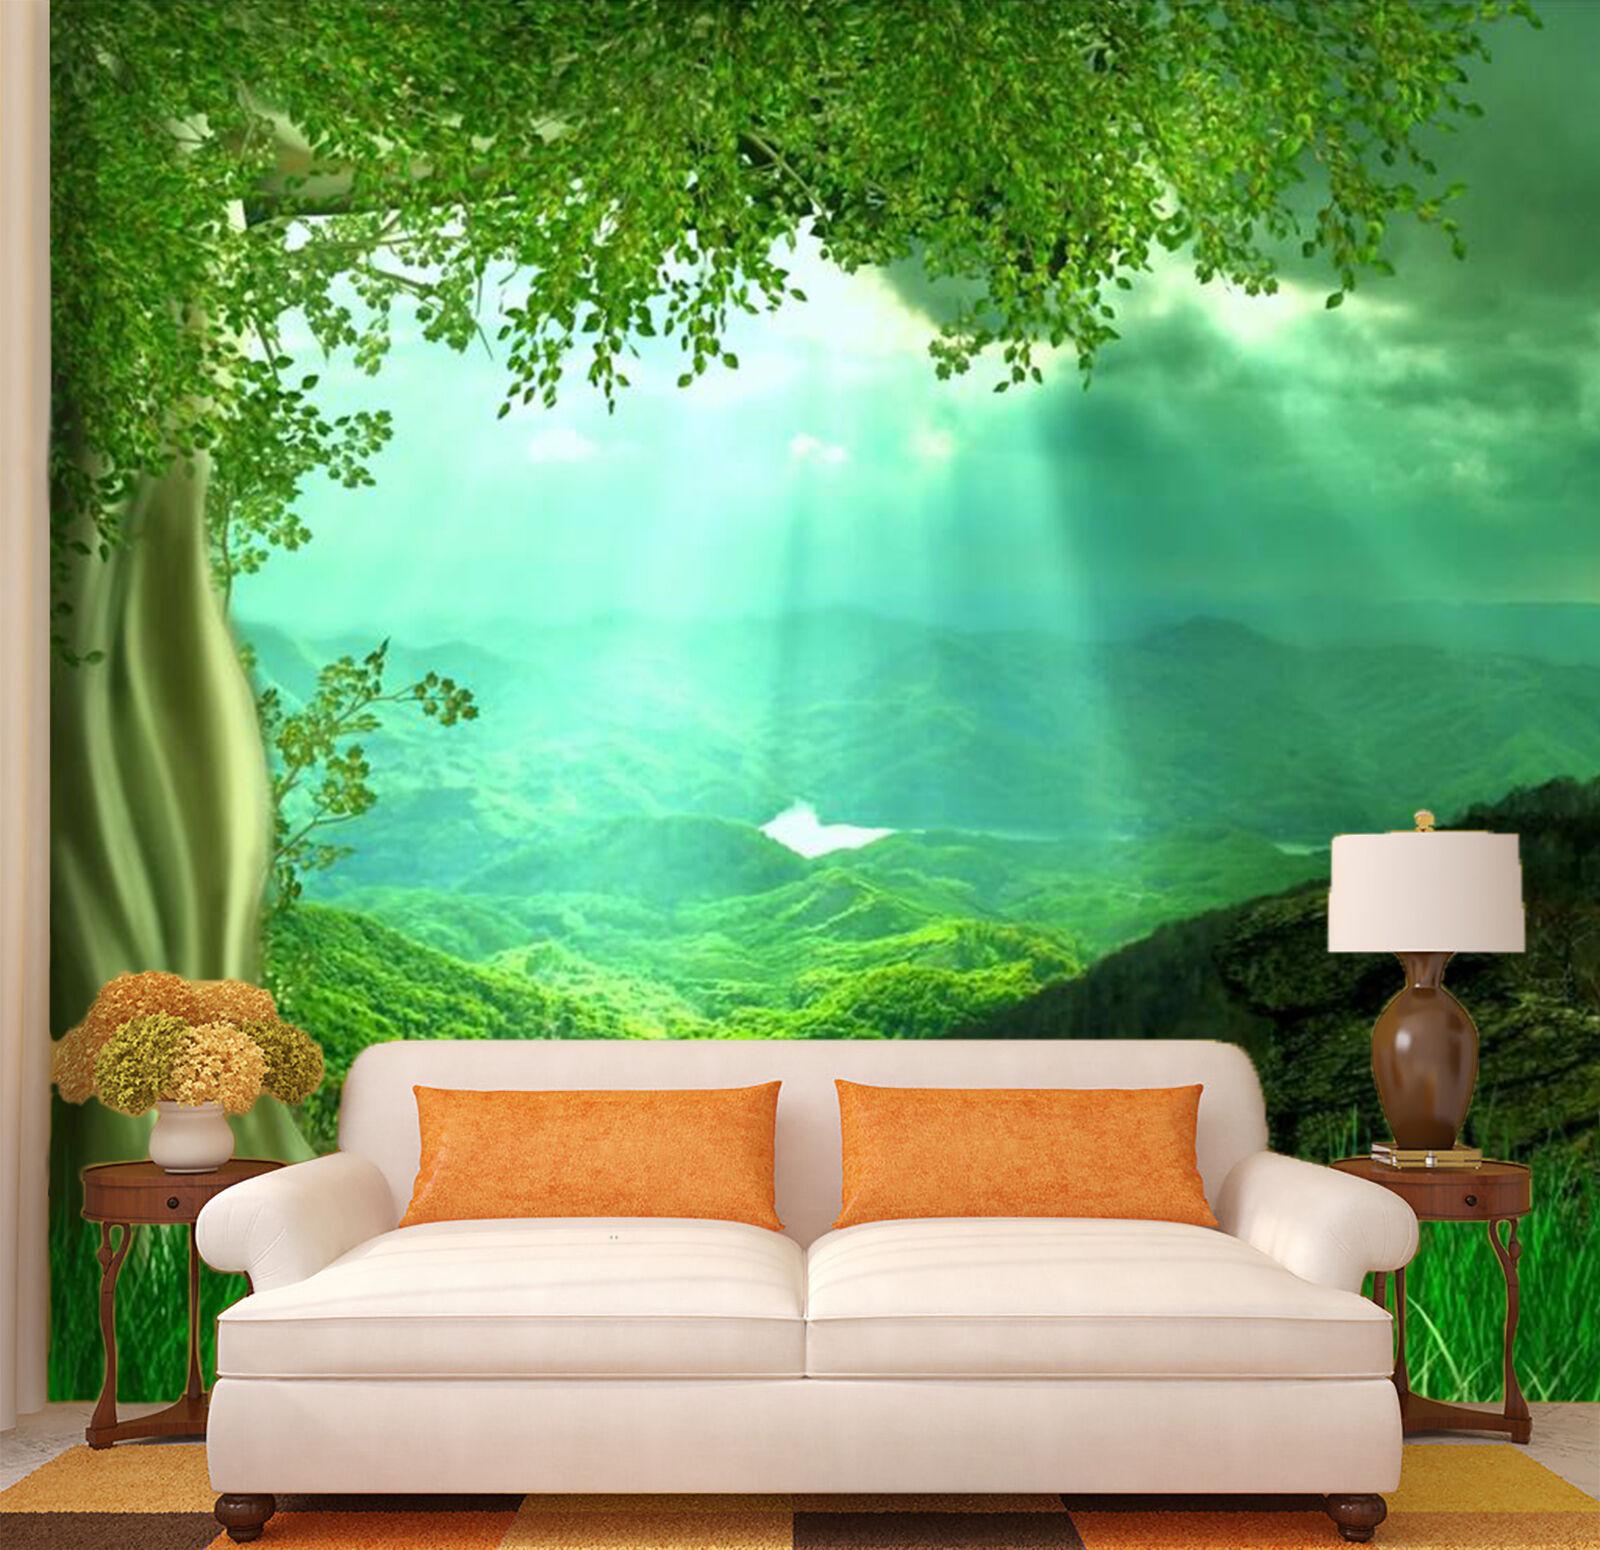 3D Sunlight Green Tree Nature 3 Wall Paper Wall Print Decal Wall AJ WALLPAPER CA